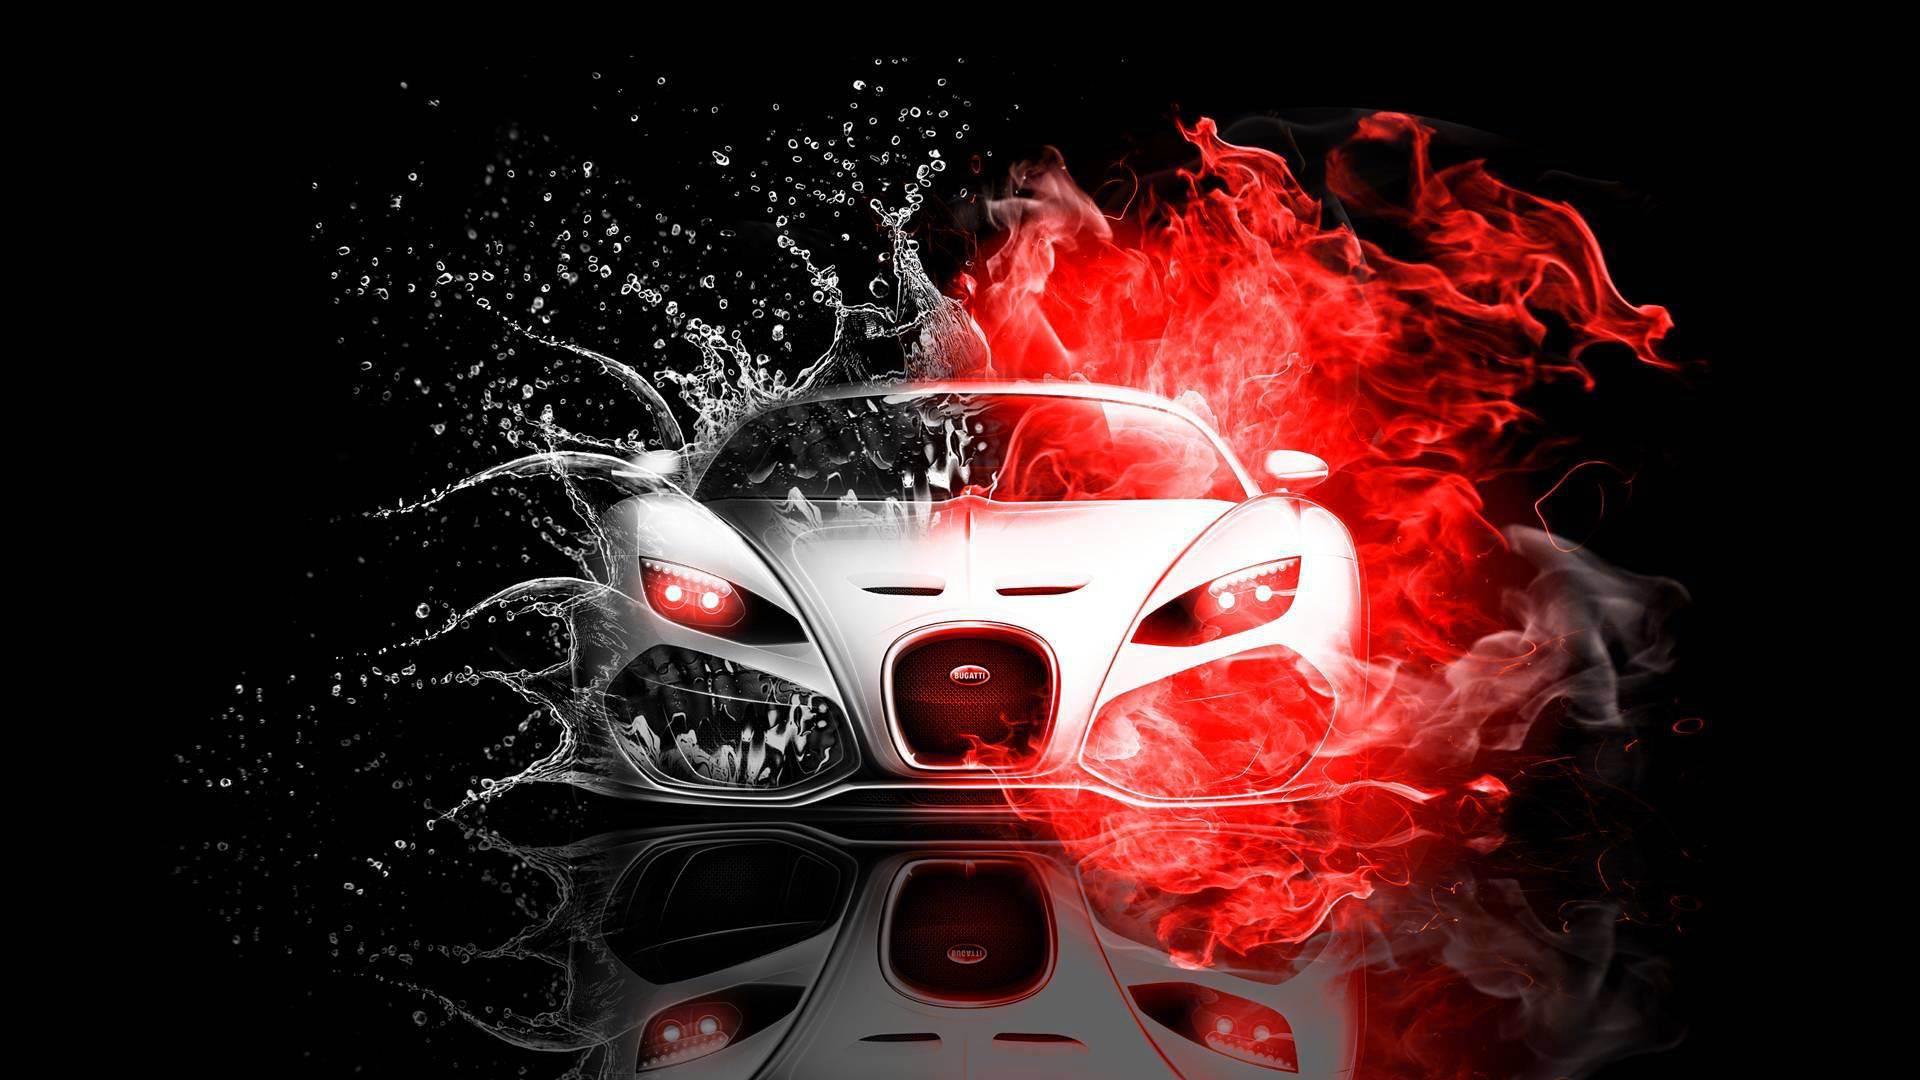 Fast And Furious 7 Car Lykan Hypersport HD Wallpaper   Stylish HD 1920x1080